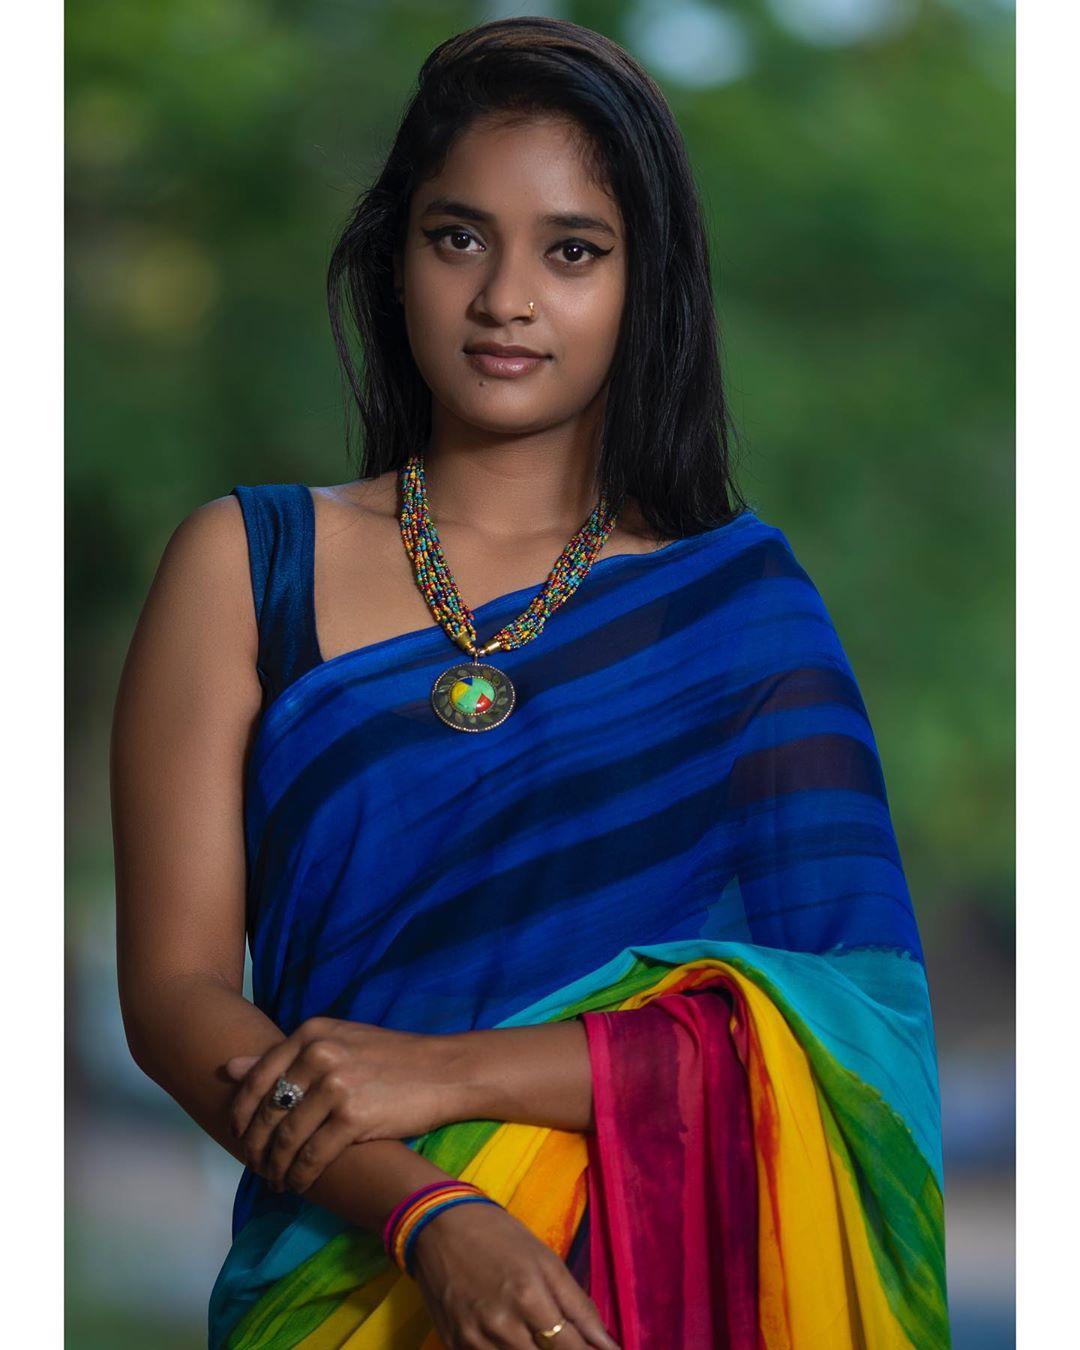 Actress Soumya Shetty In Saree Hot And Sexy Photos Telugu Actress Gallery